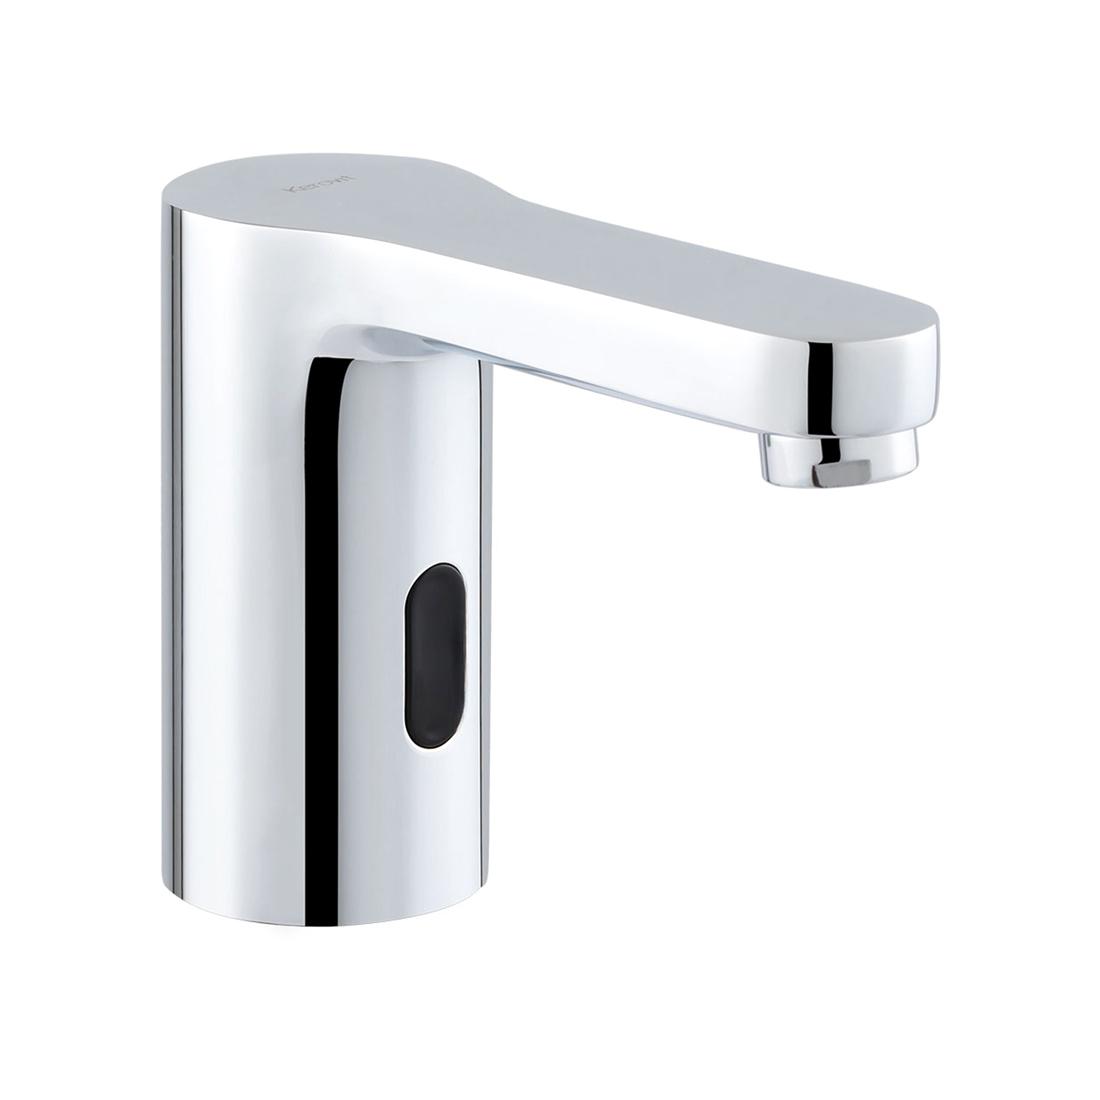 Kerovit KBST002 Sensor Tap for Wash Basin